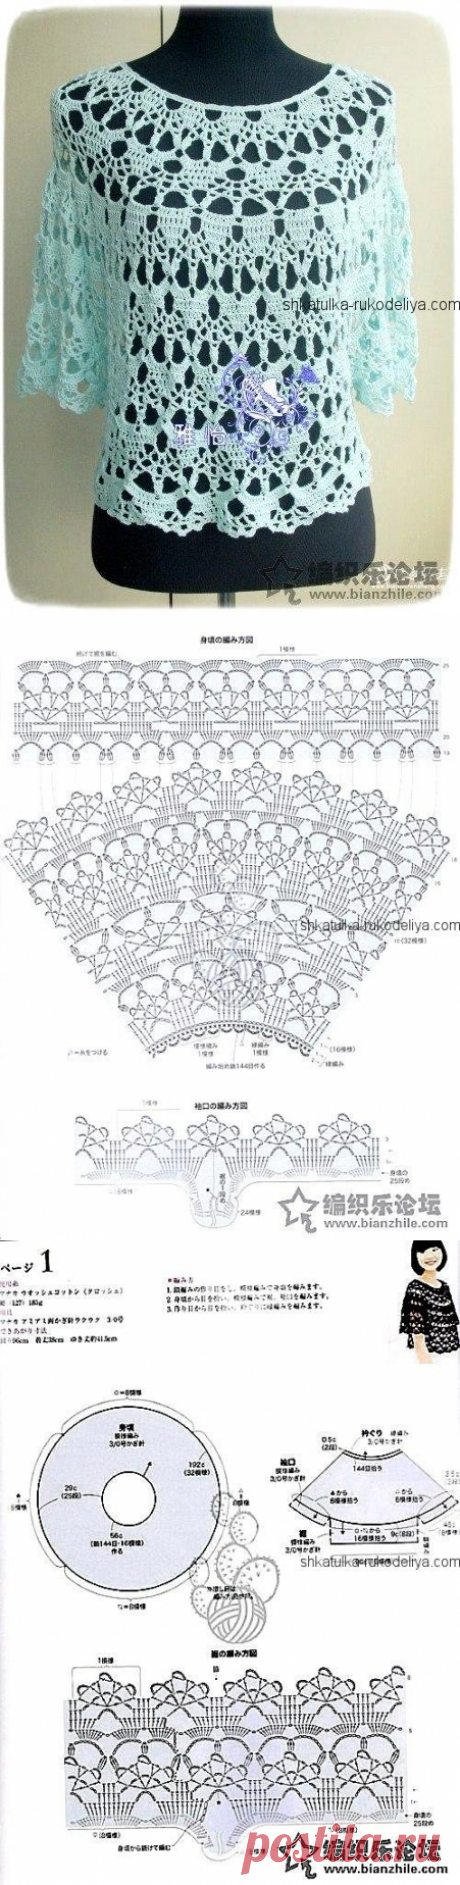 Ажурная блуза крючком. Схема вязания летней блузы крючком | Шкатулка рукоделия. Сайт для рукодельниц.